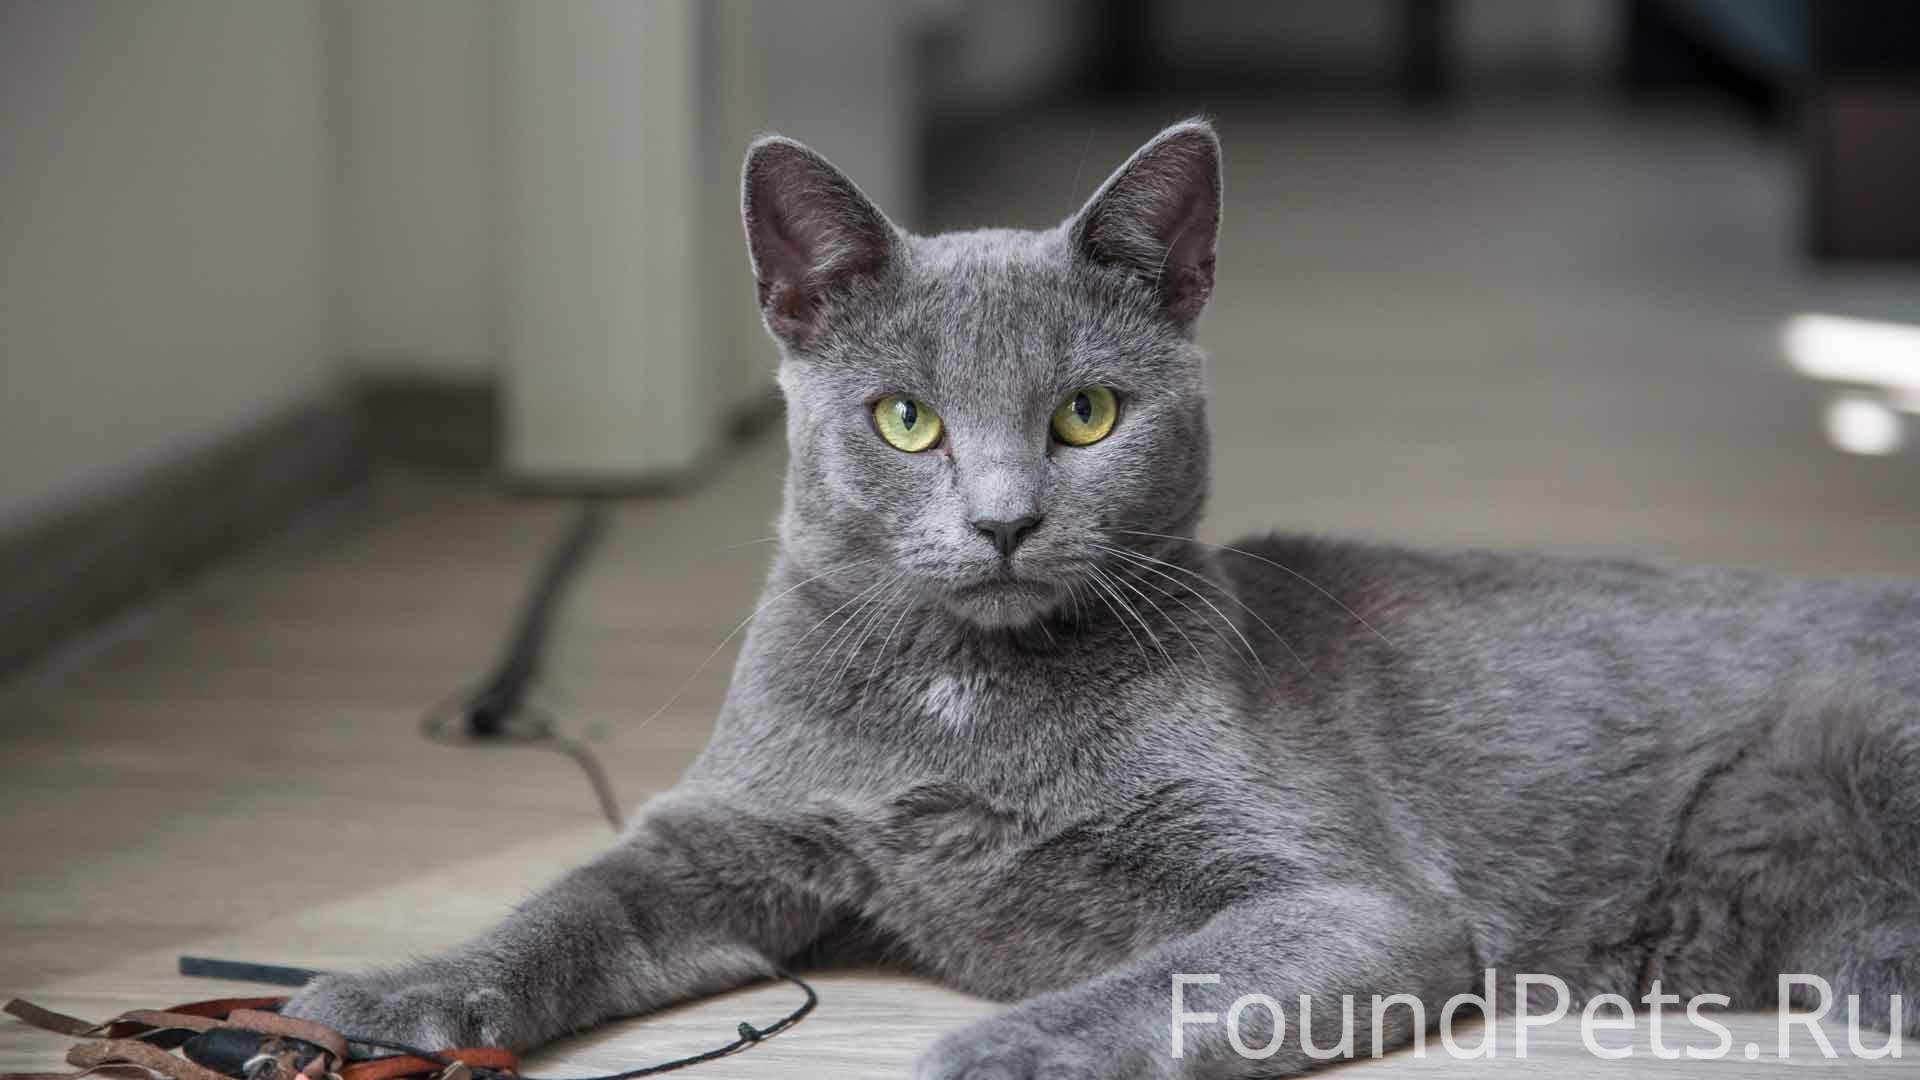 Кошка корат: происхождение, характеристика, уход